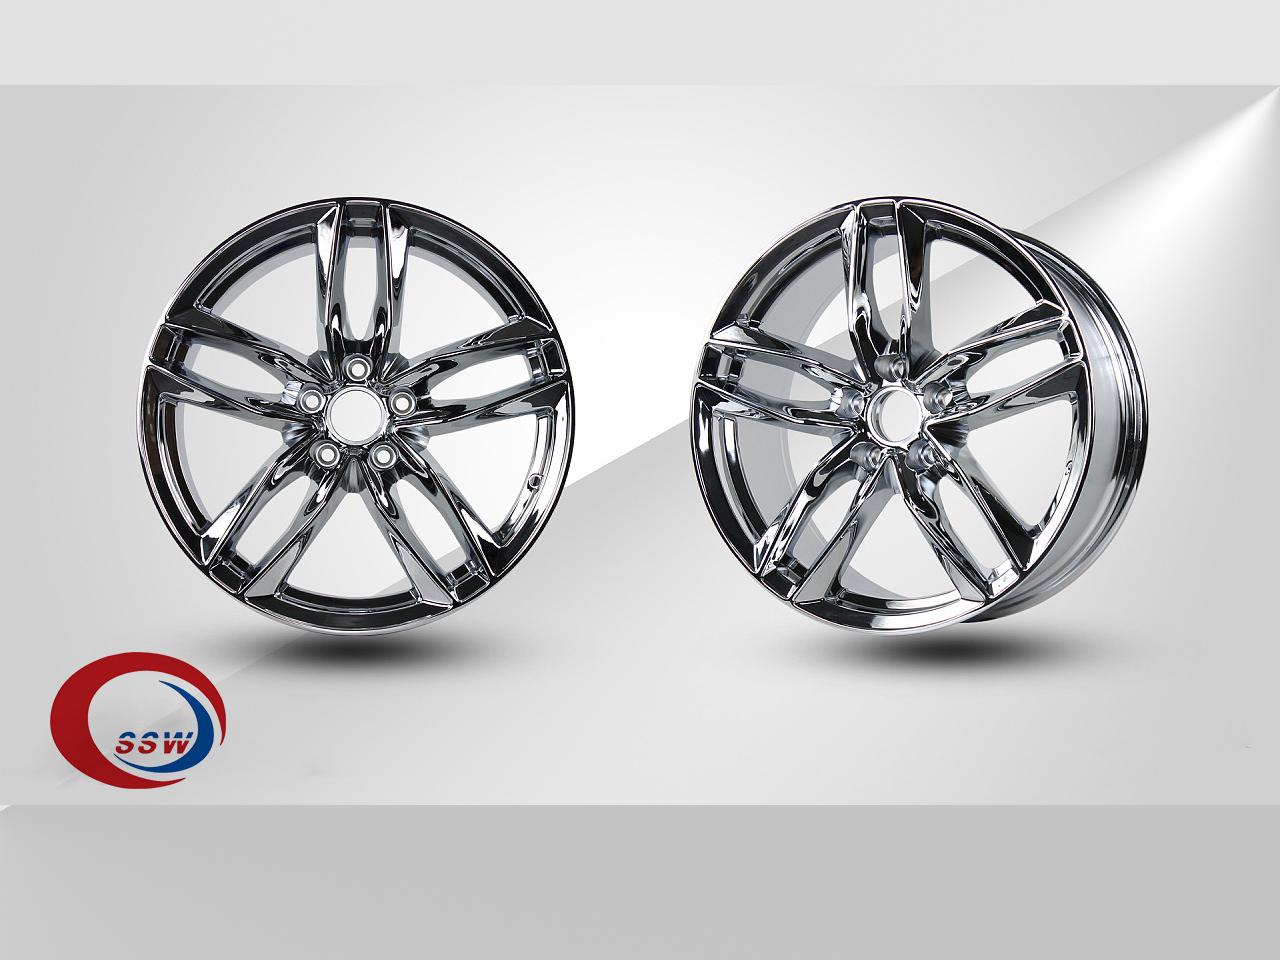 16-28 inches wheels aluminum alloy wheels a18